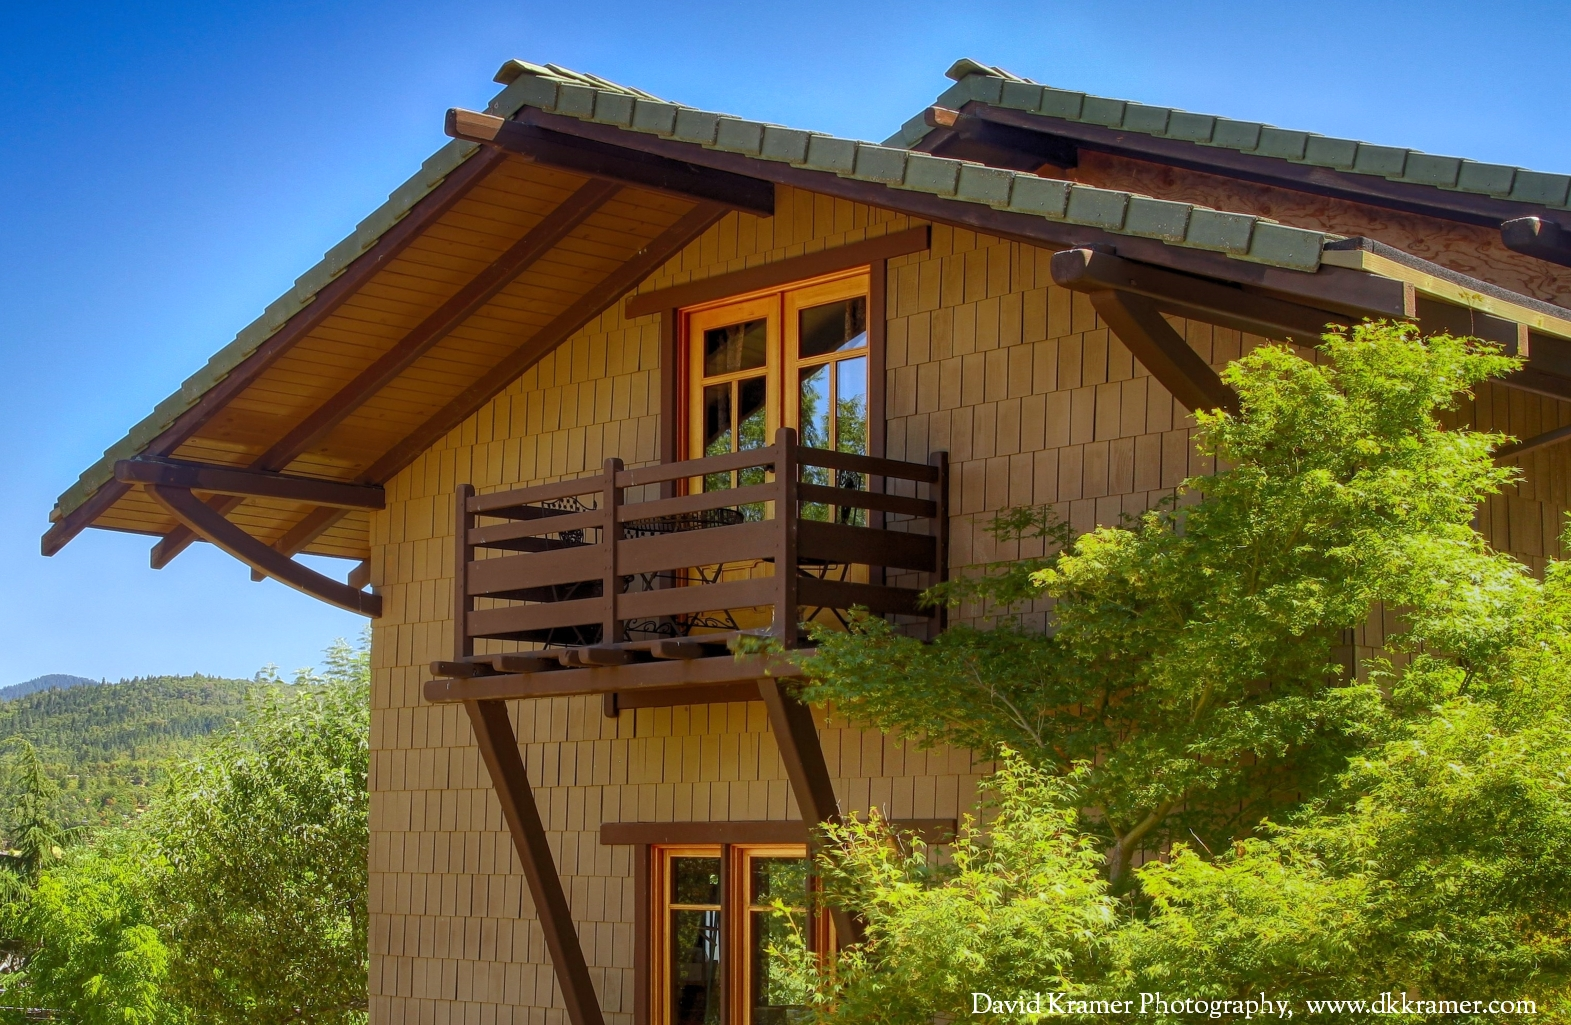 DKP - Lilac Guest House 01.jpg